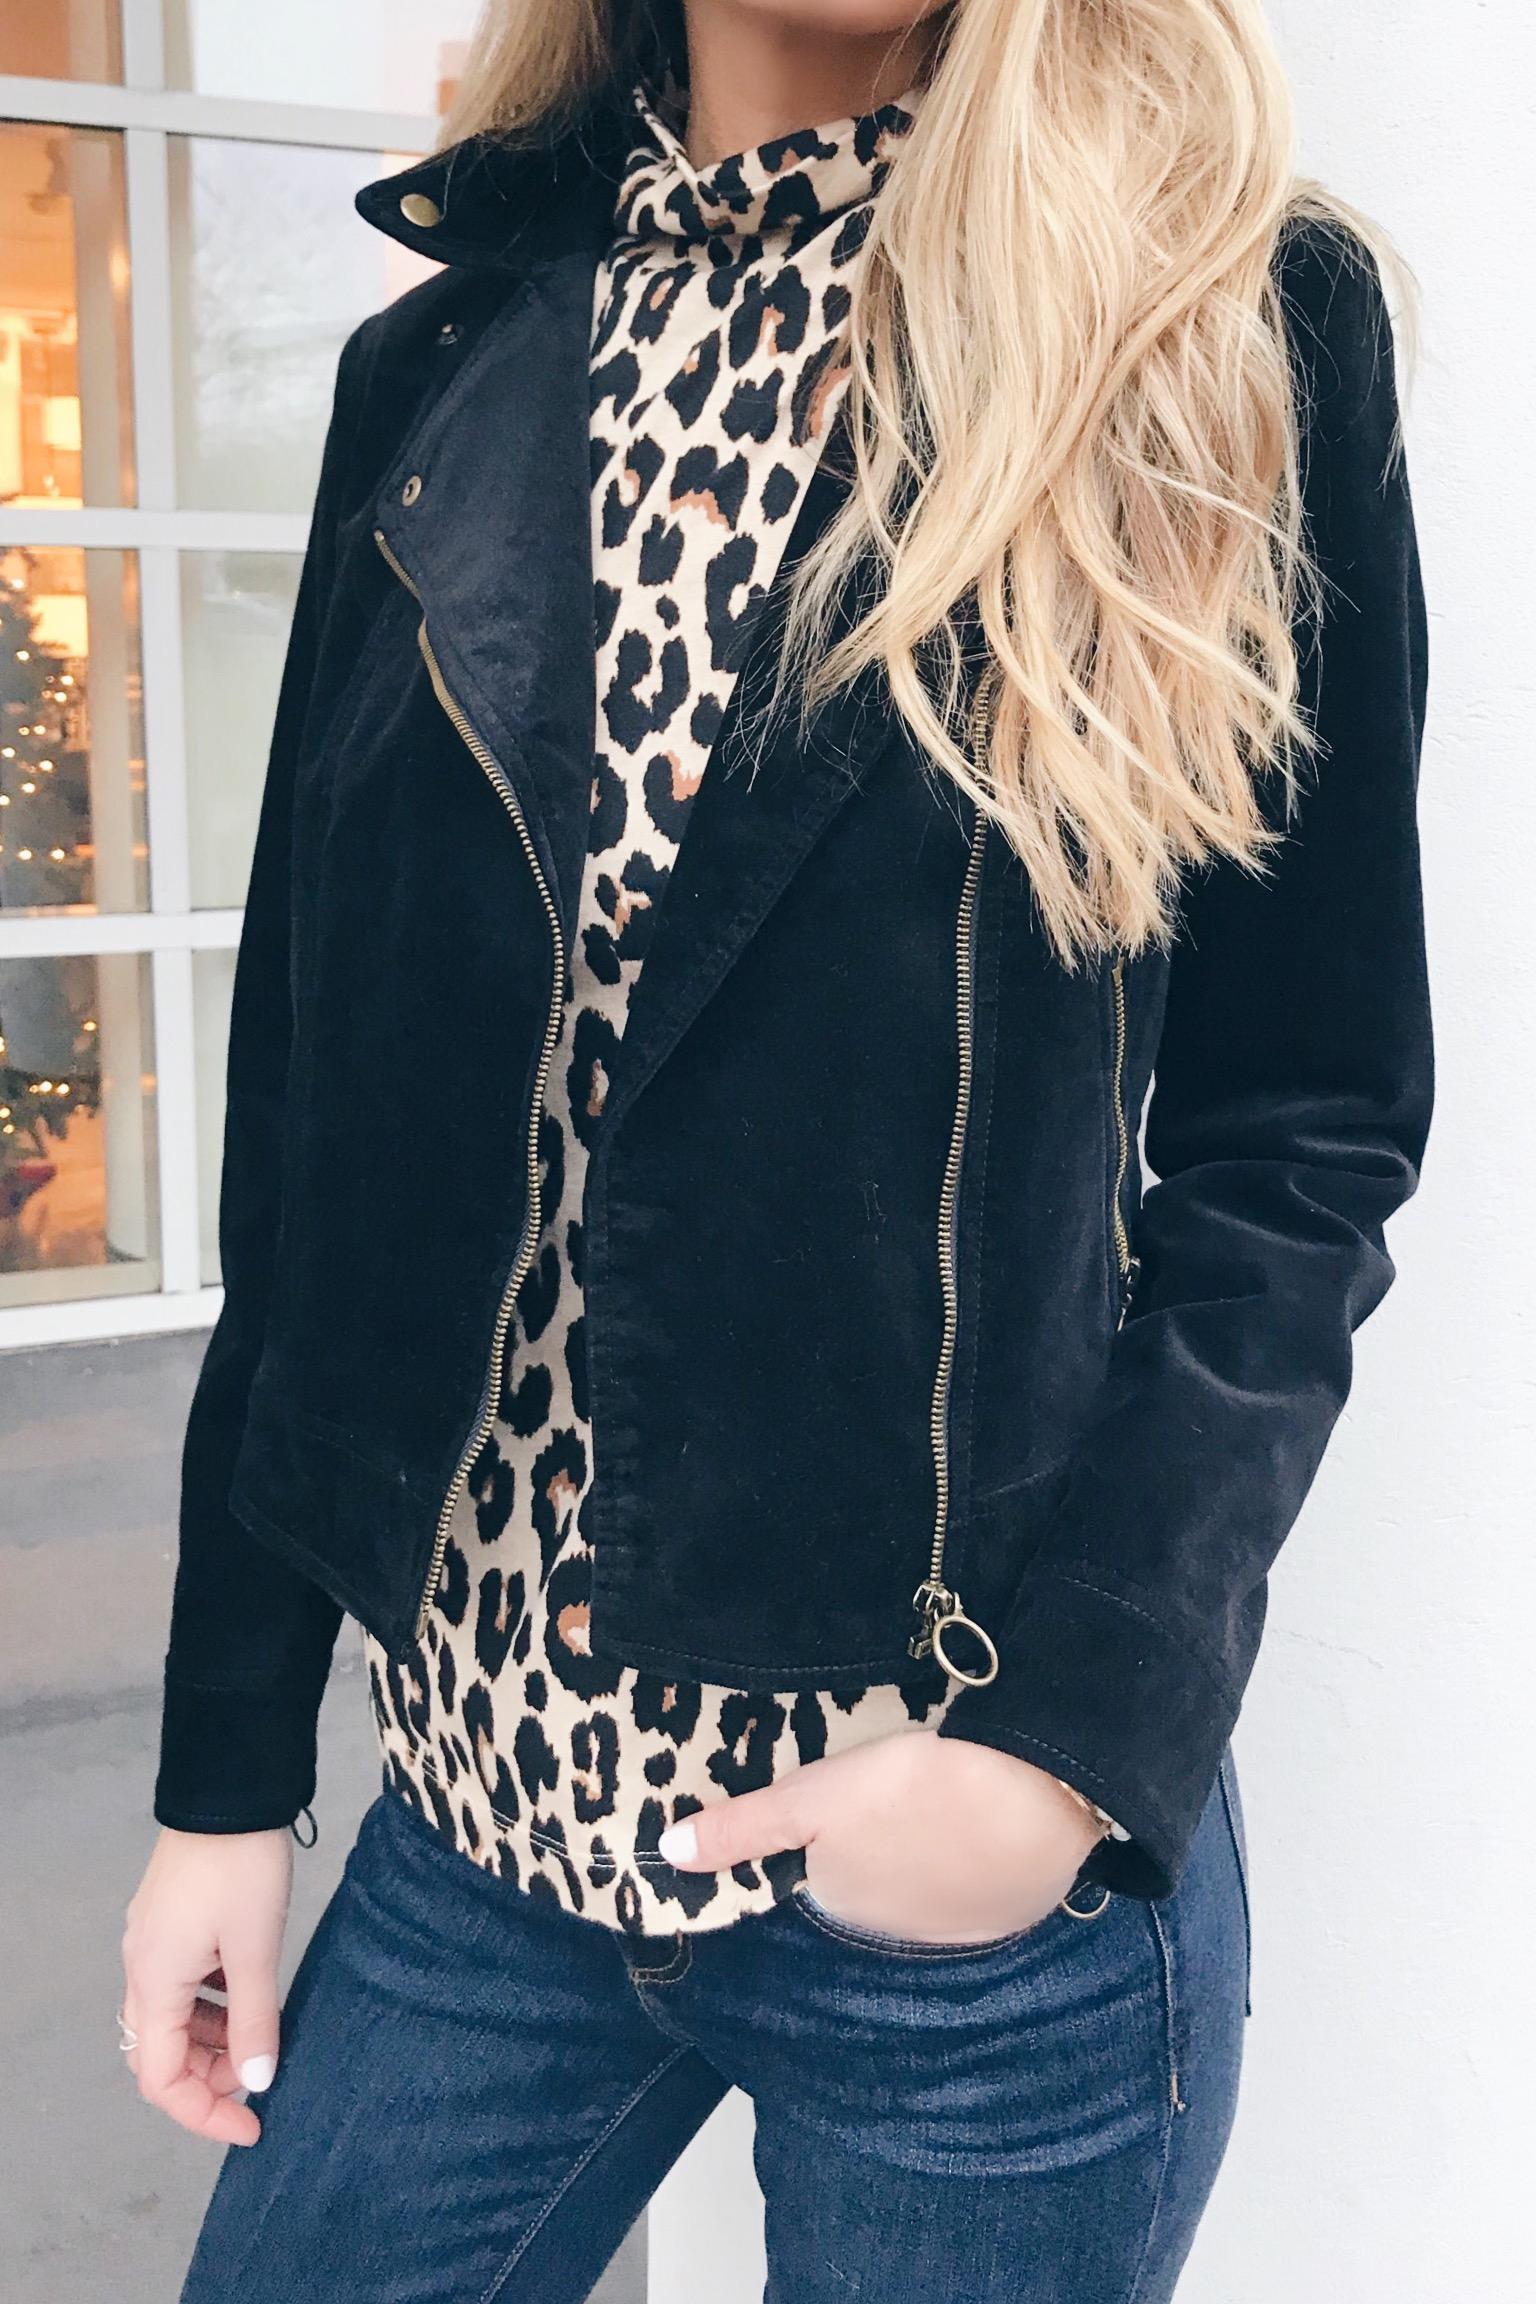 leopard turtleneck and black velvet moto jacket - leopard holiday party outfits